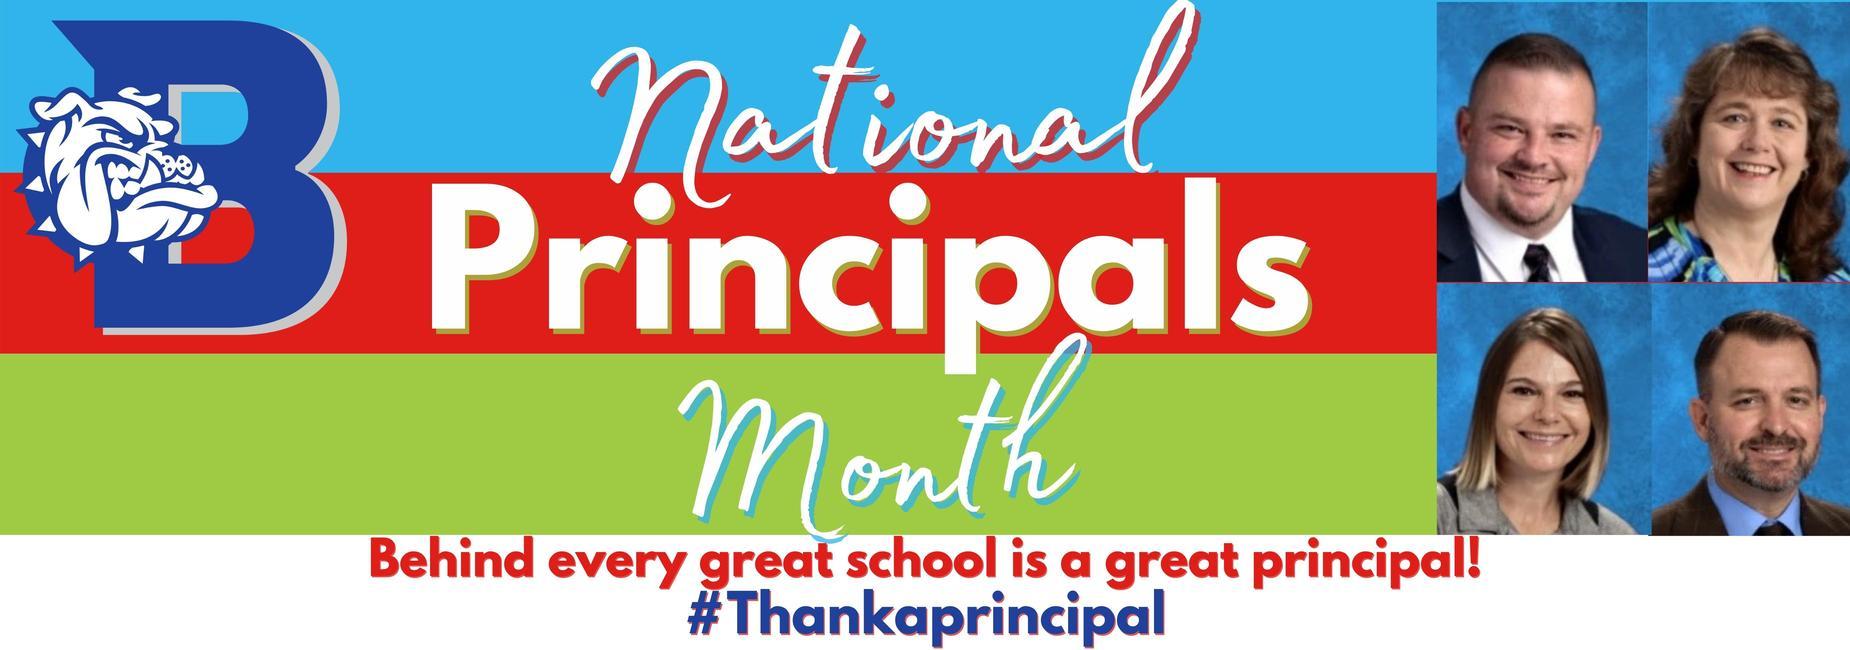 National Principal month